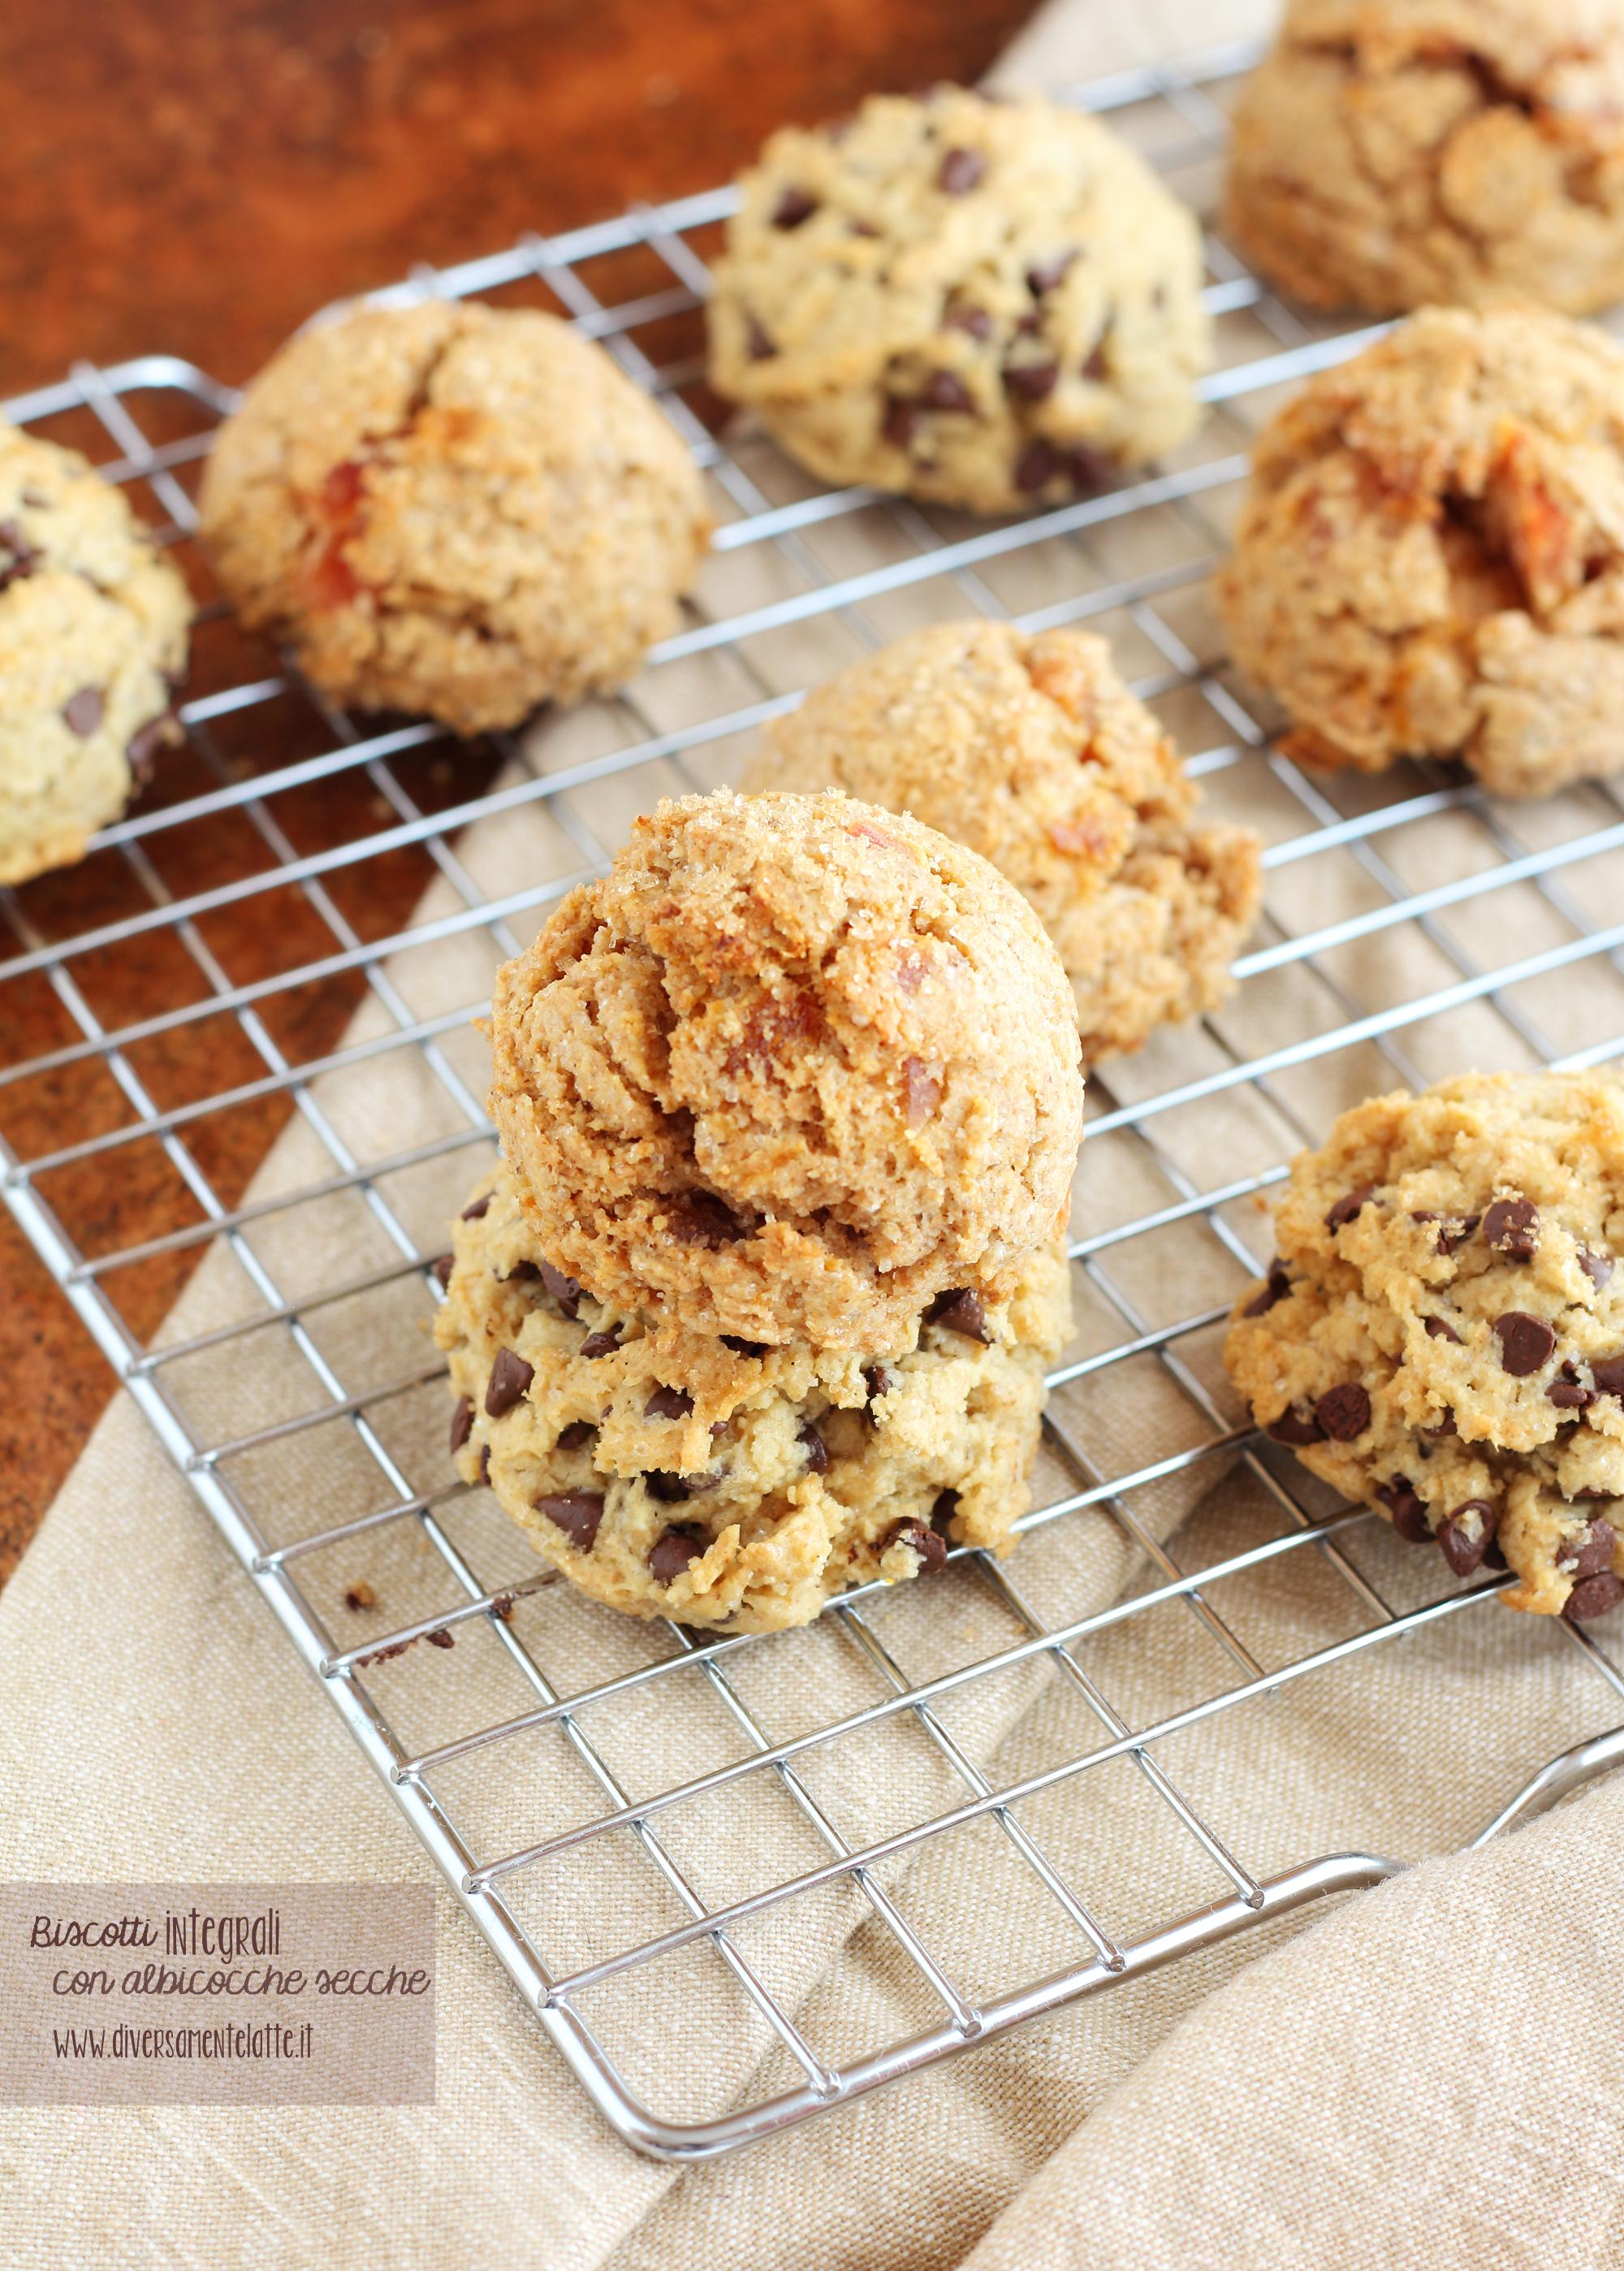 biscotti integrali vegan